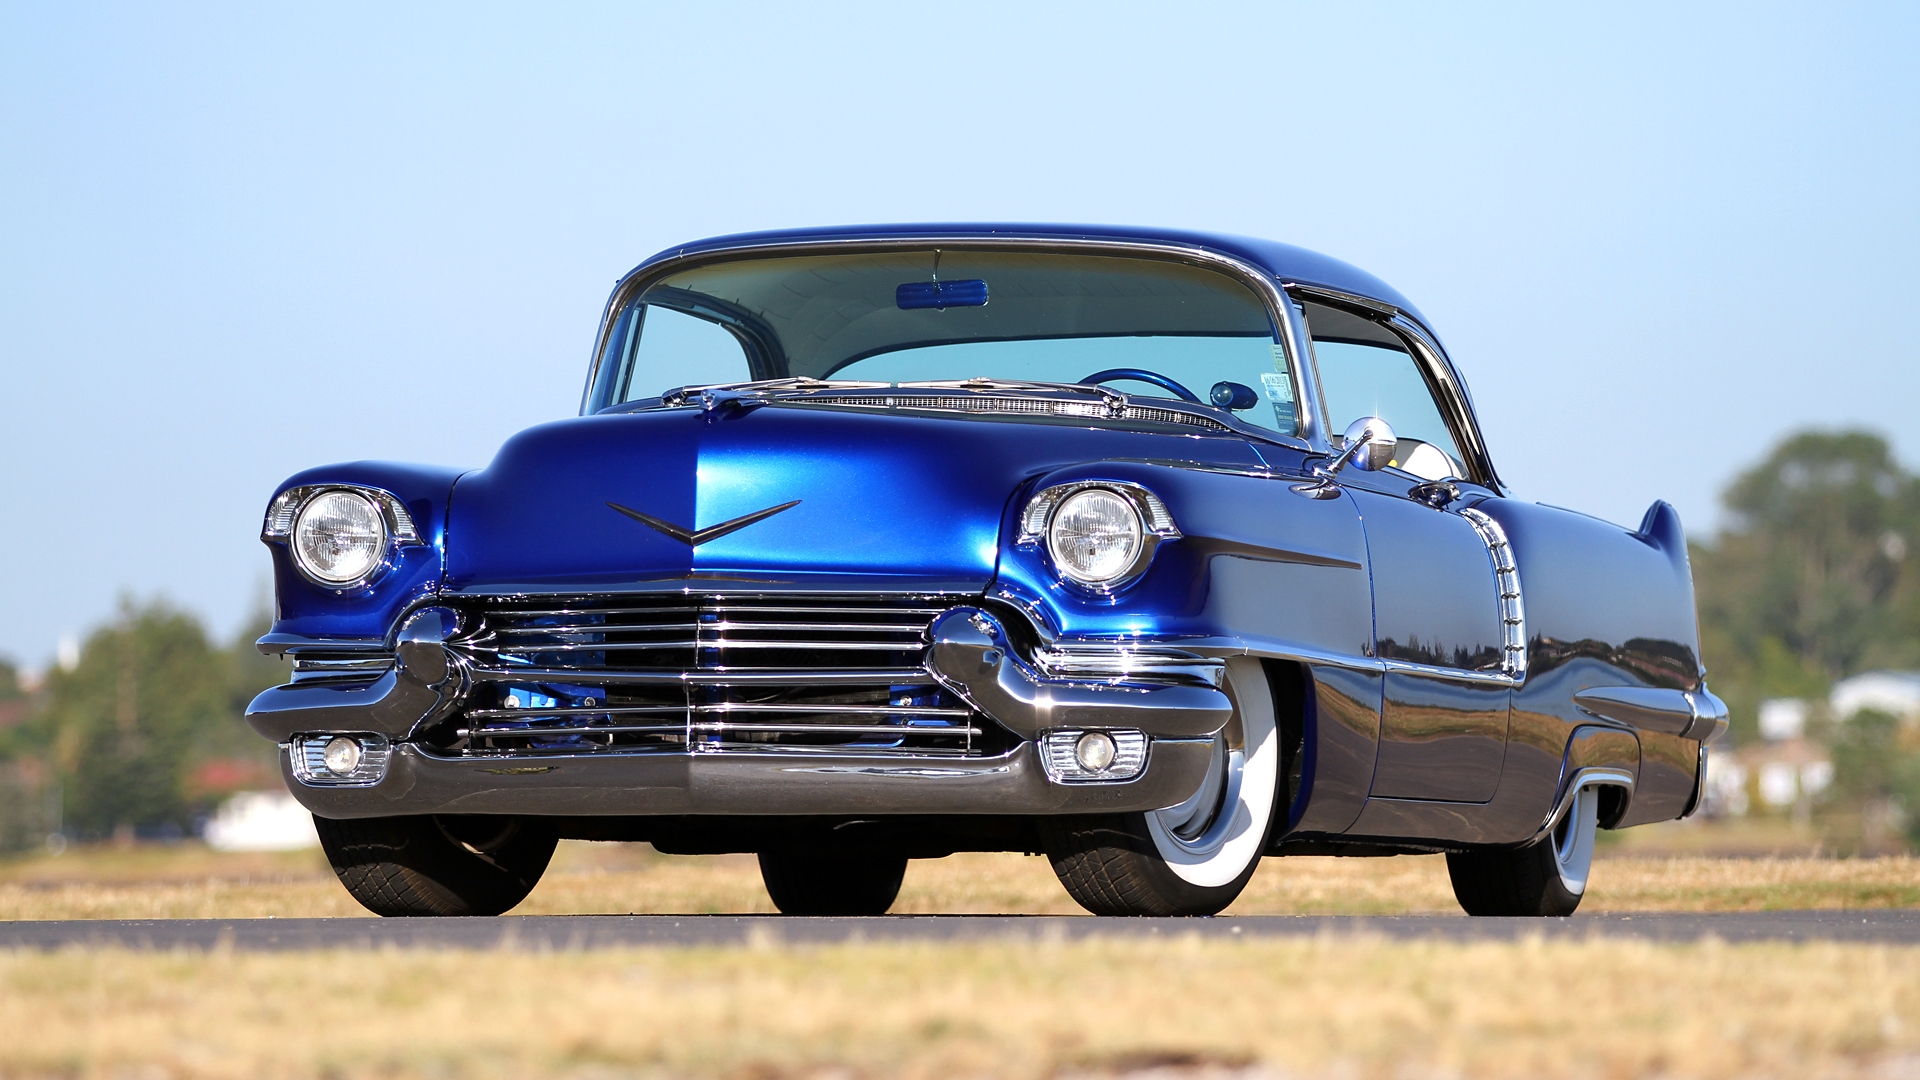 7 1956 cadillac hd wallpapers background images - Cadillac wallpaper ...